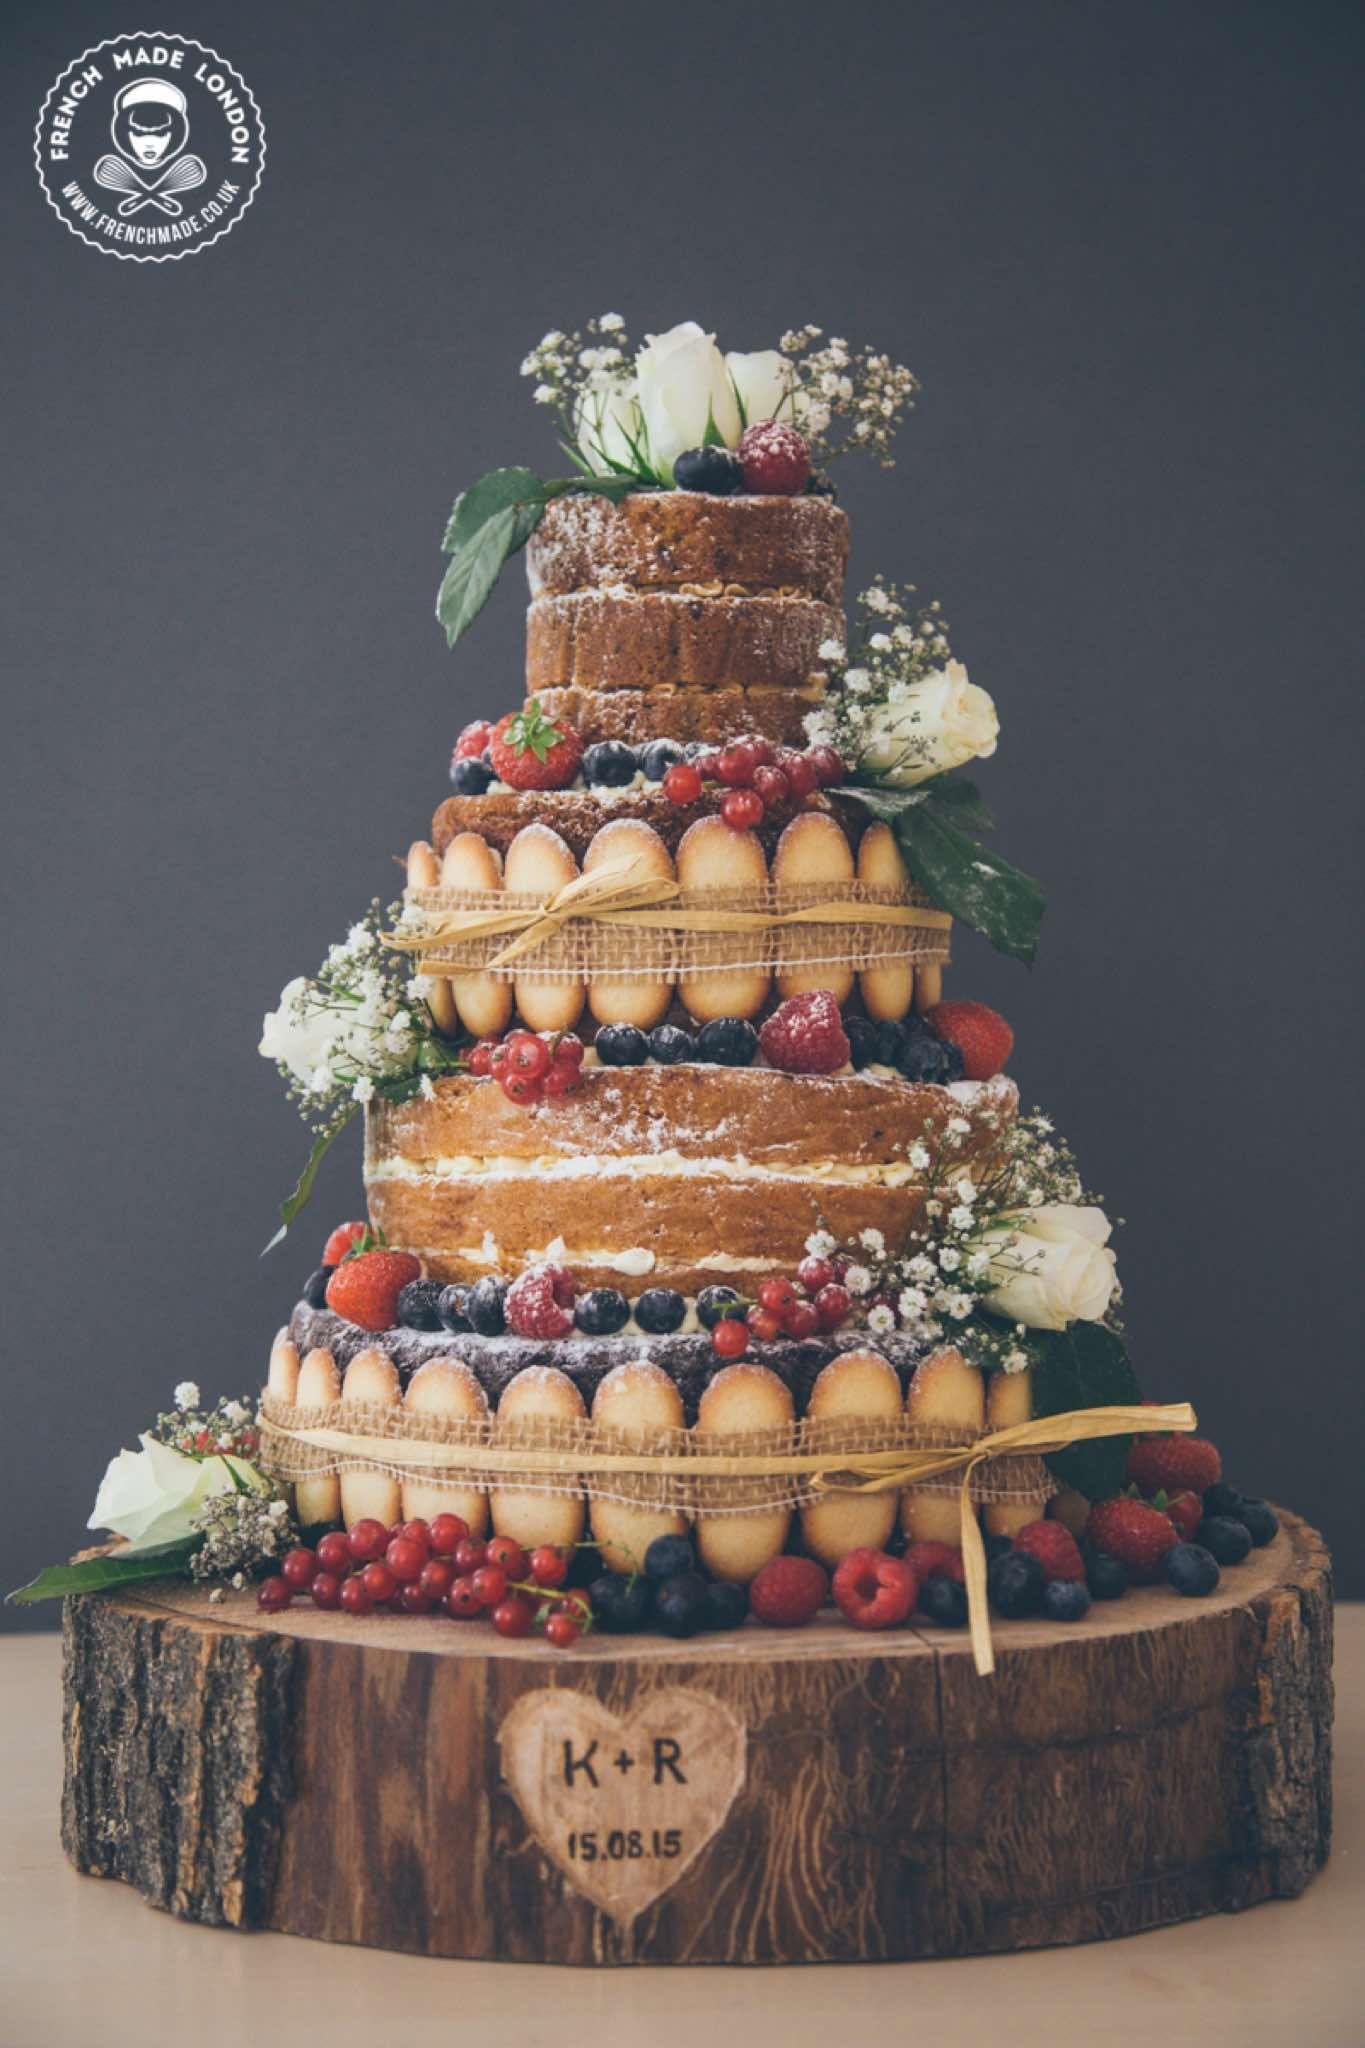 Pin on Wedding Cake Inspiration.